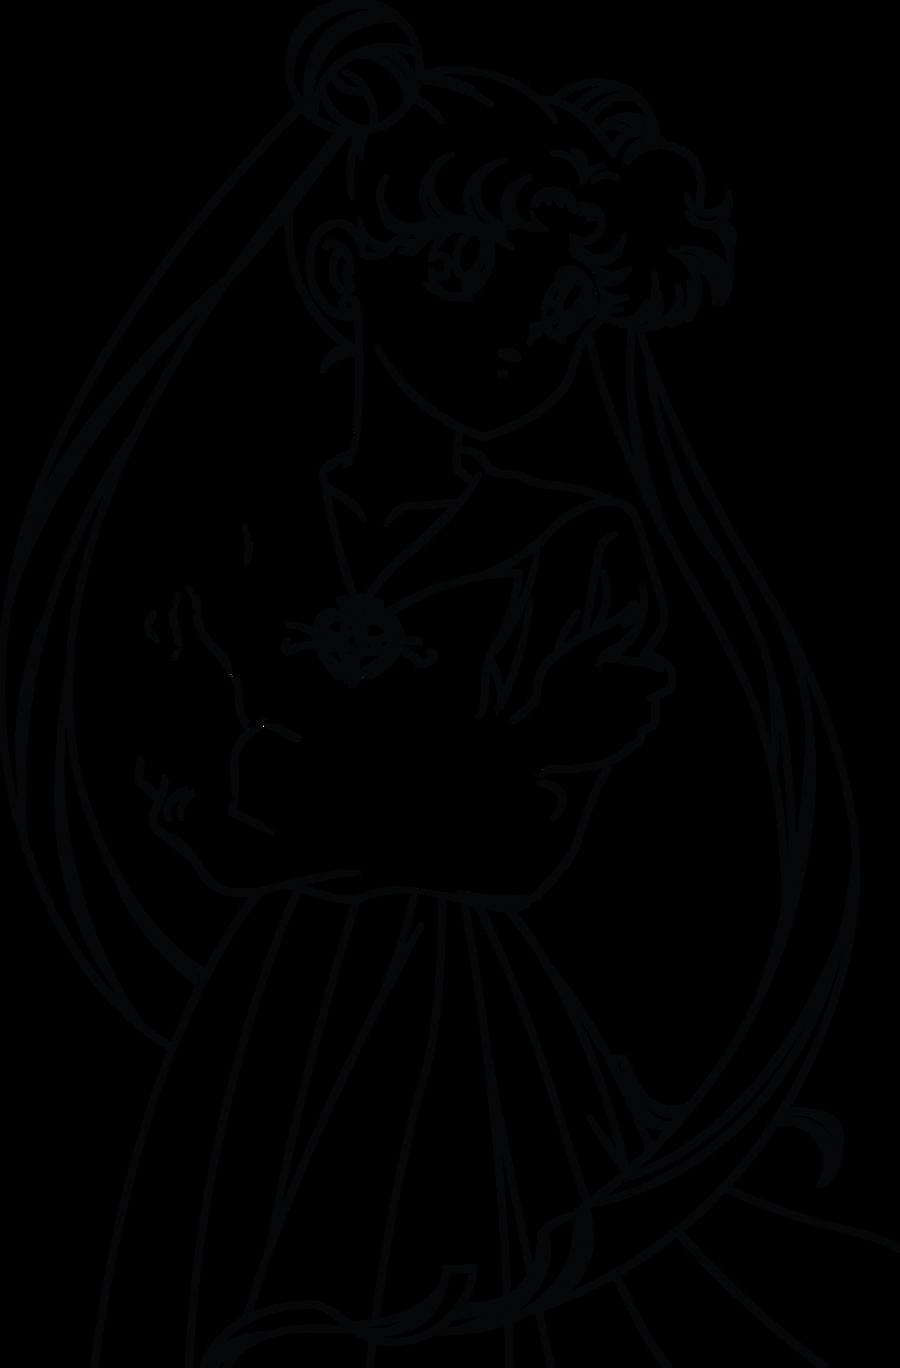 Line Drawing Moon : Sailor moon line art by sayurixsama on deviantart